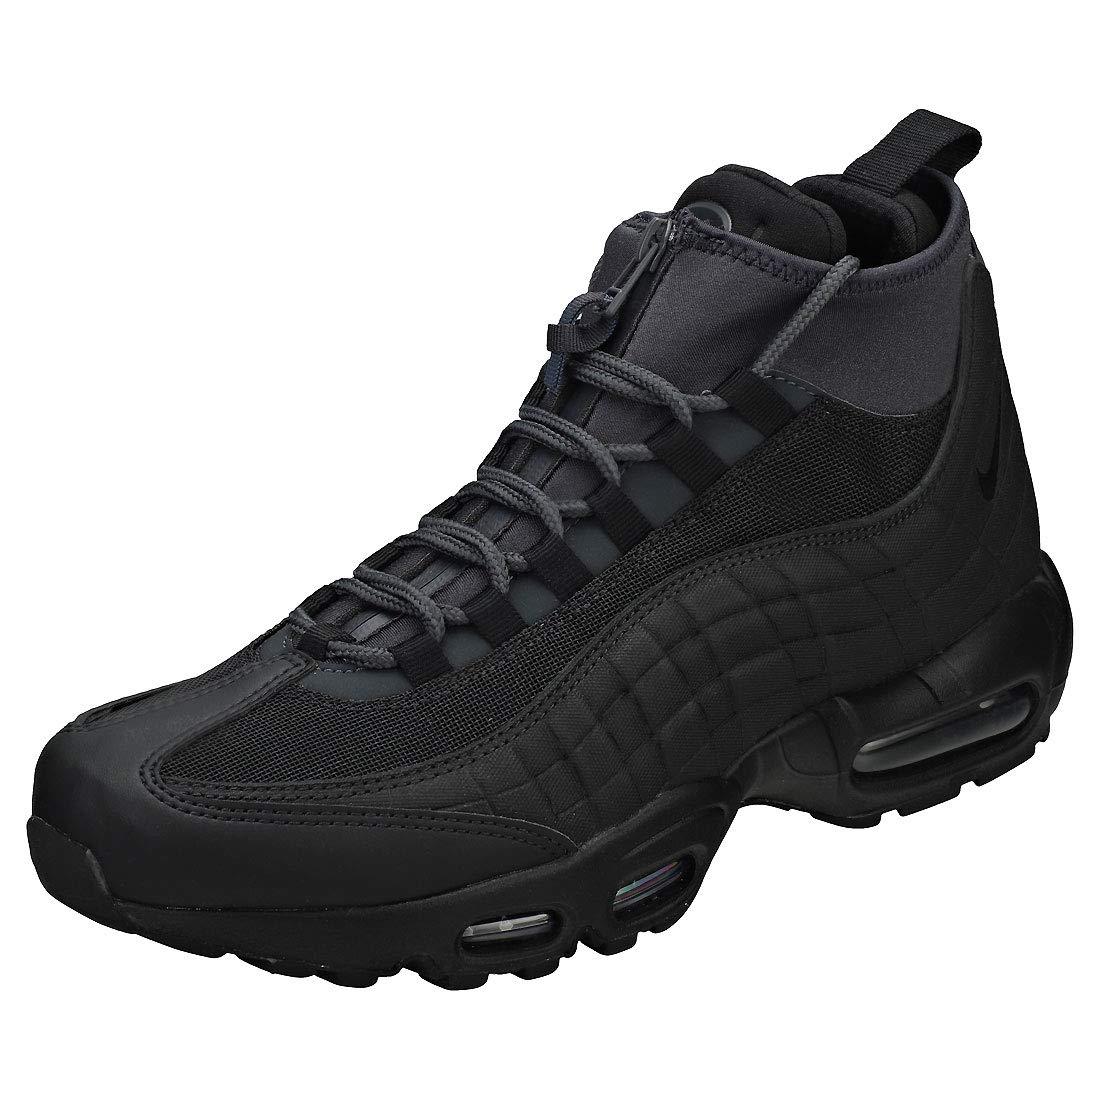 Nike Air Max 95 Sneakerboot BlackAnthracite White 806809